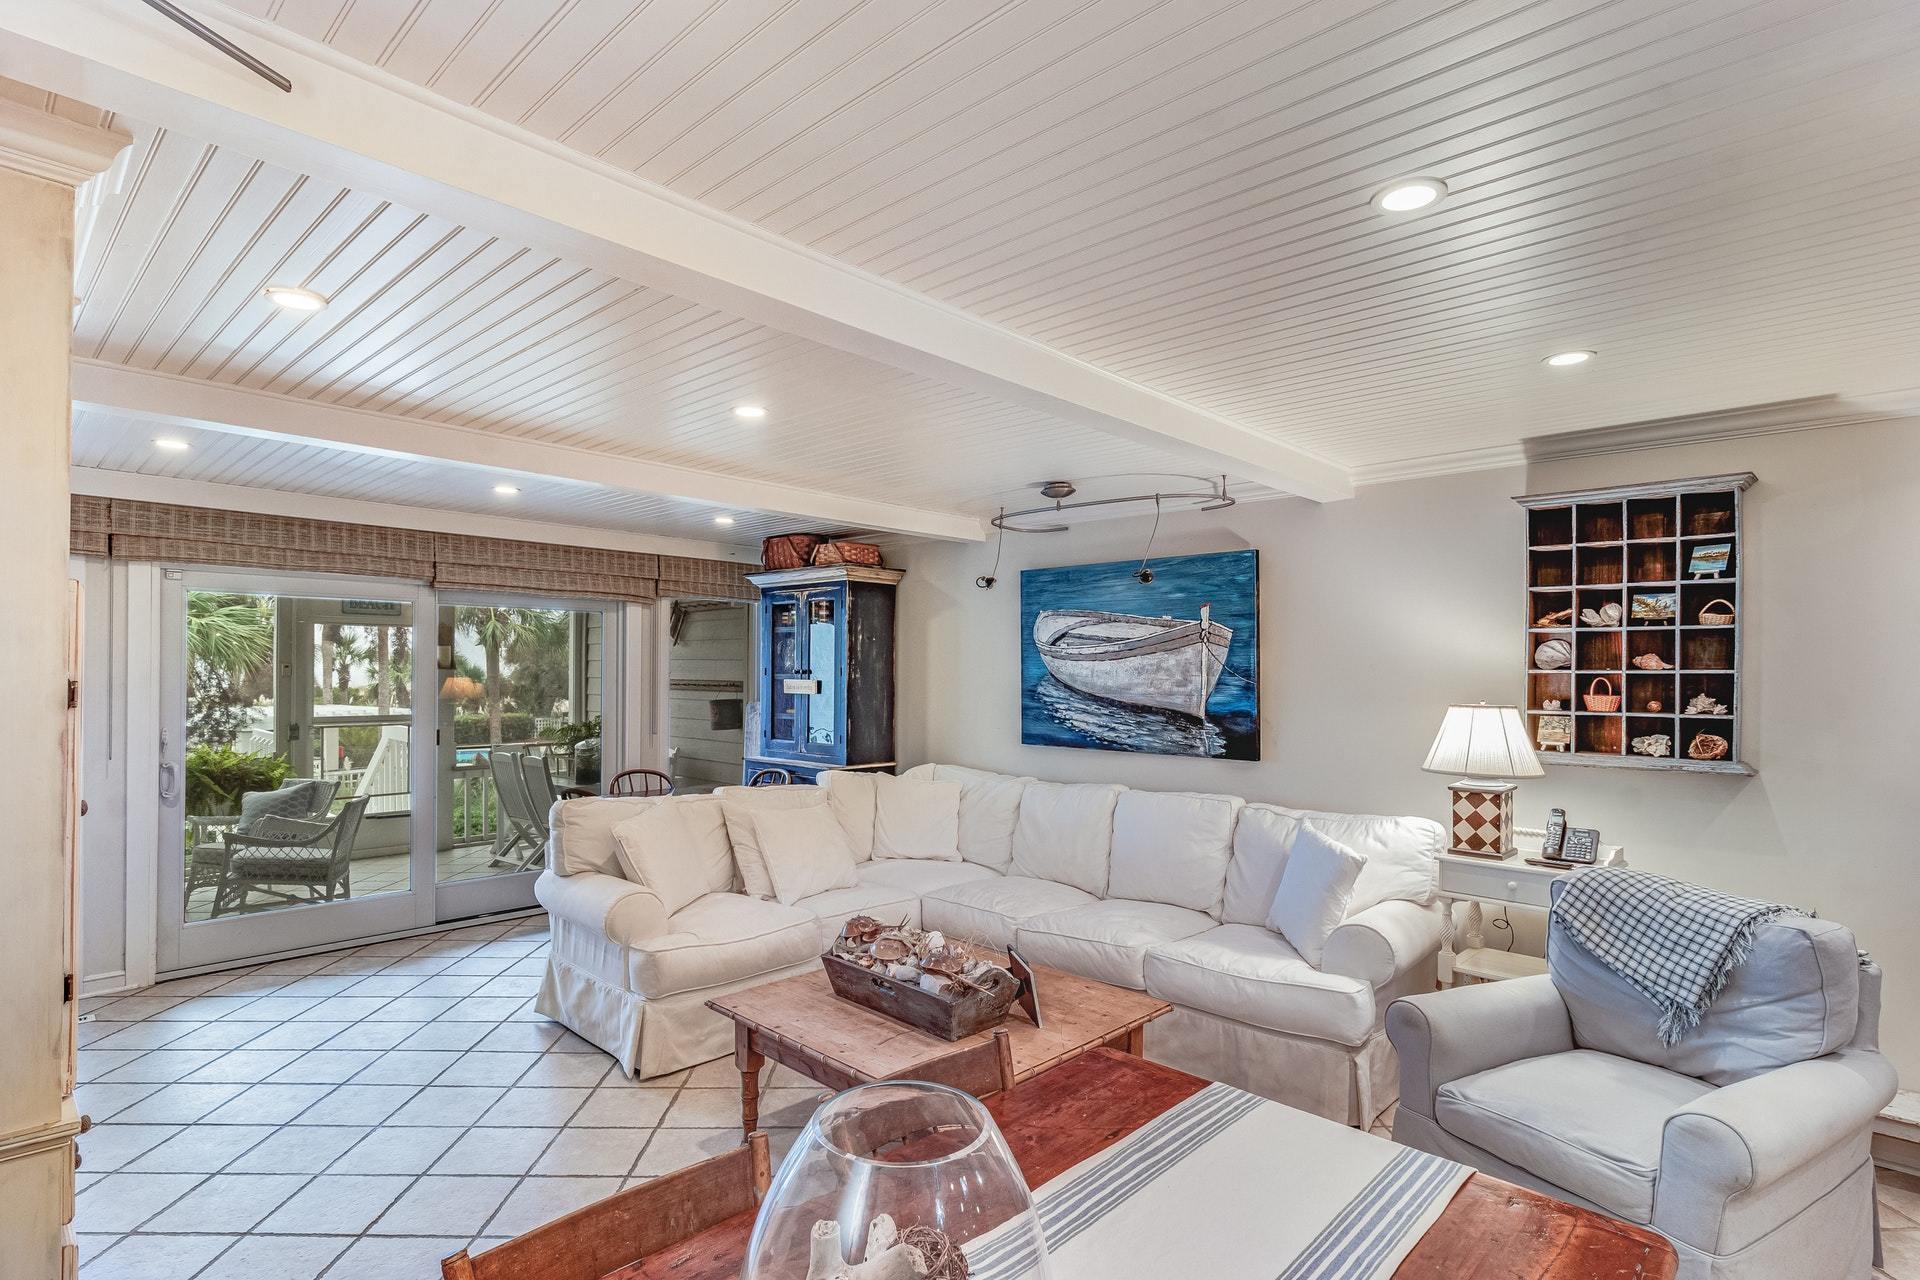 51 Beach Club Villas Isle Of Palms, SC 29451